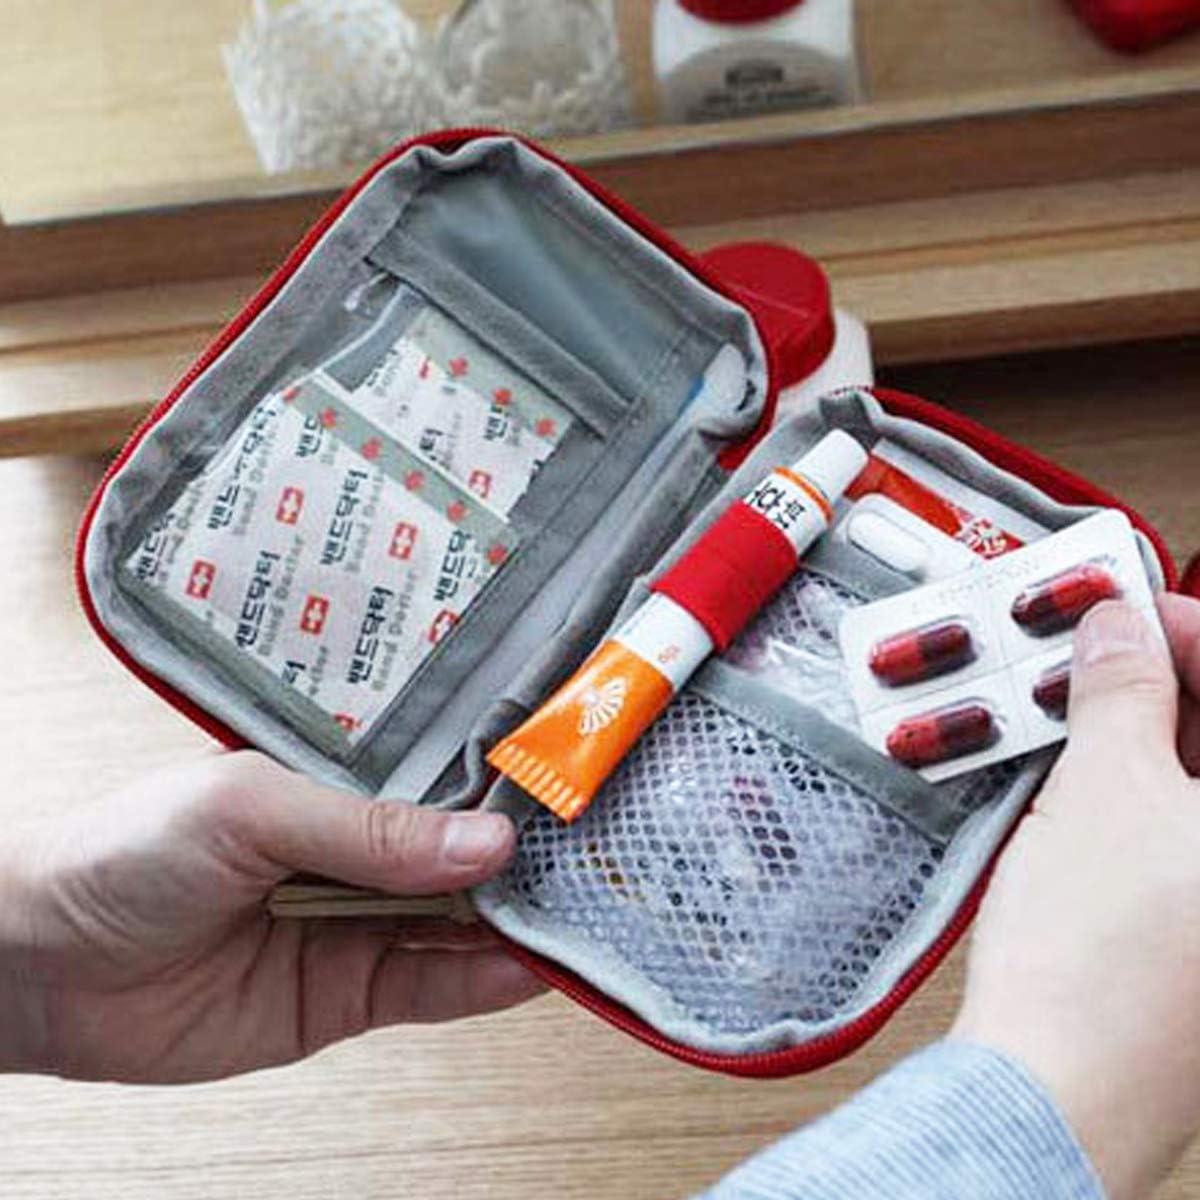 Botiqu/ín de Primeros Auxilios,Zuzer 3PCS Bolsa M/édica Vacio Bolso de Primeros Auxilios Bolsa de Medicinas para Coche Camping Viajes